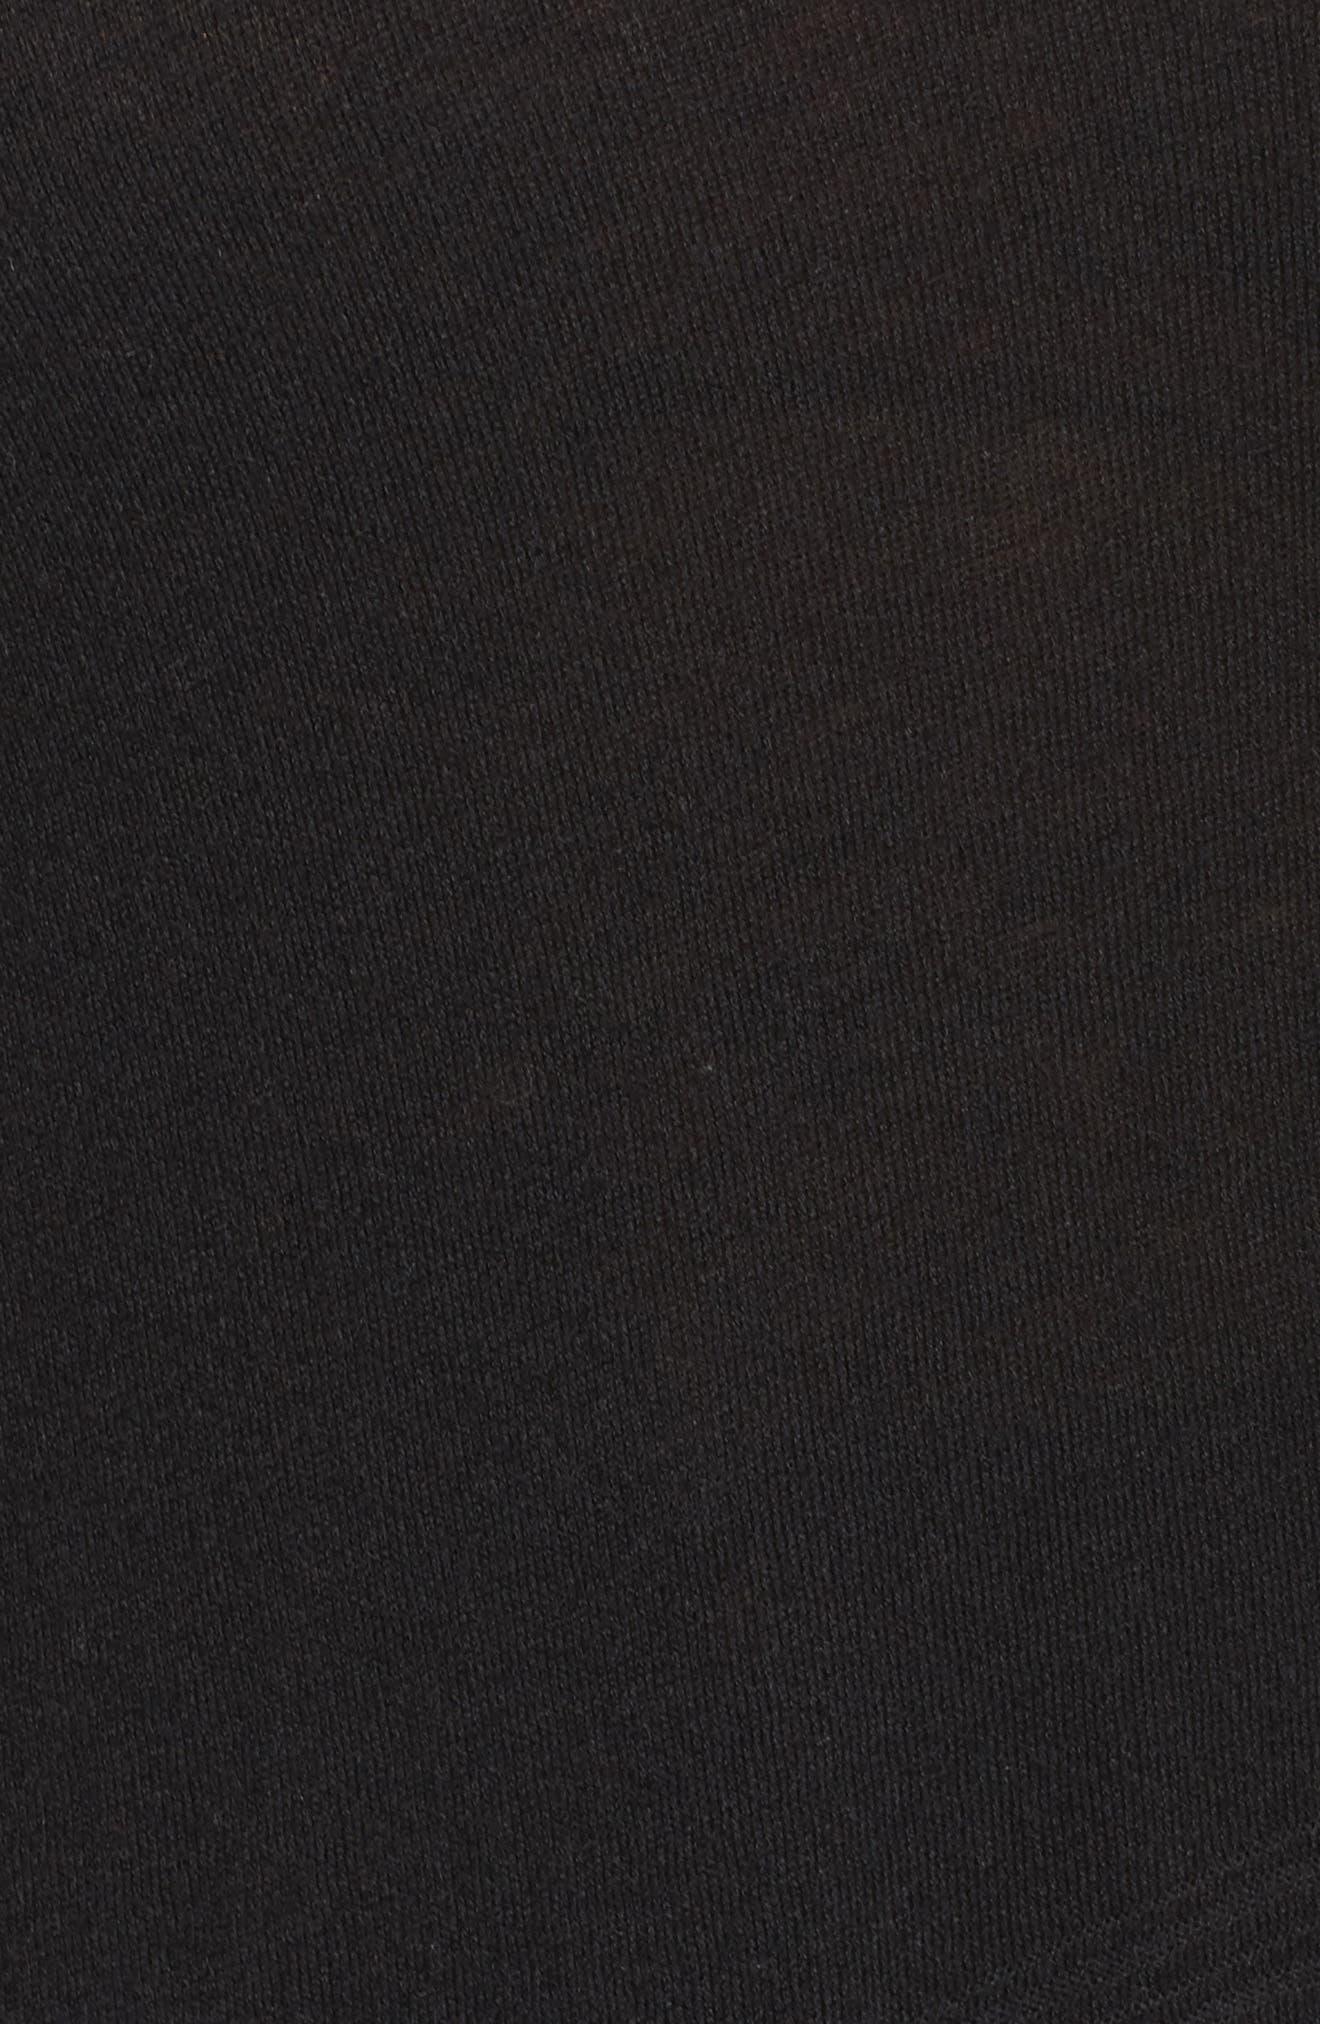 Asymmetrical Hem Sweater,                             Alternate thumbnail 5, color,                             001